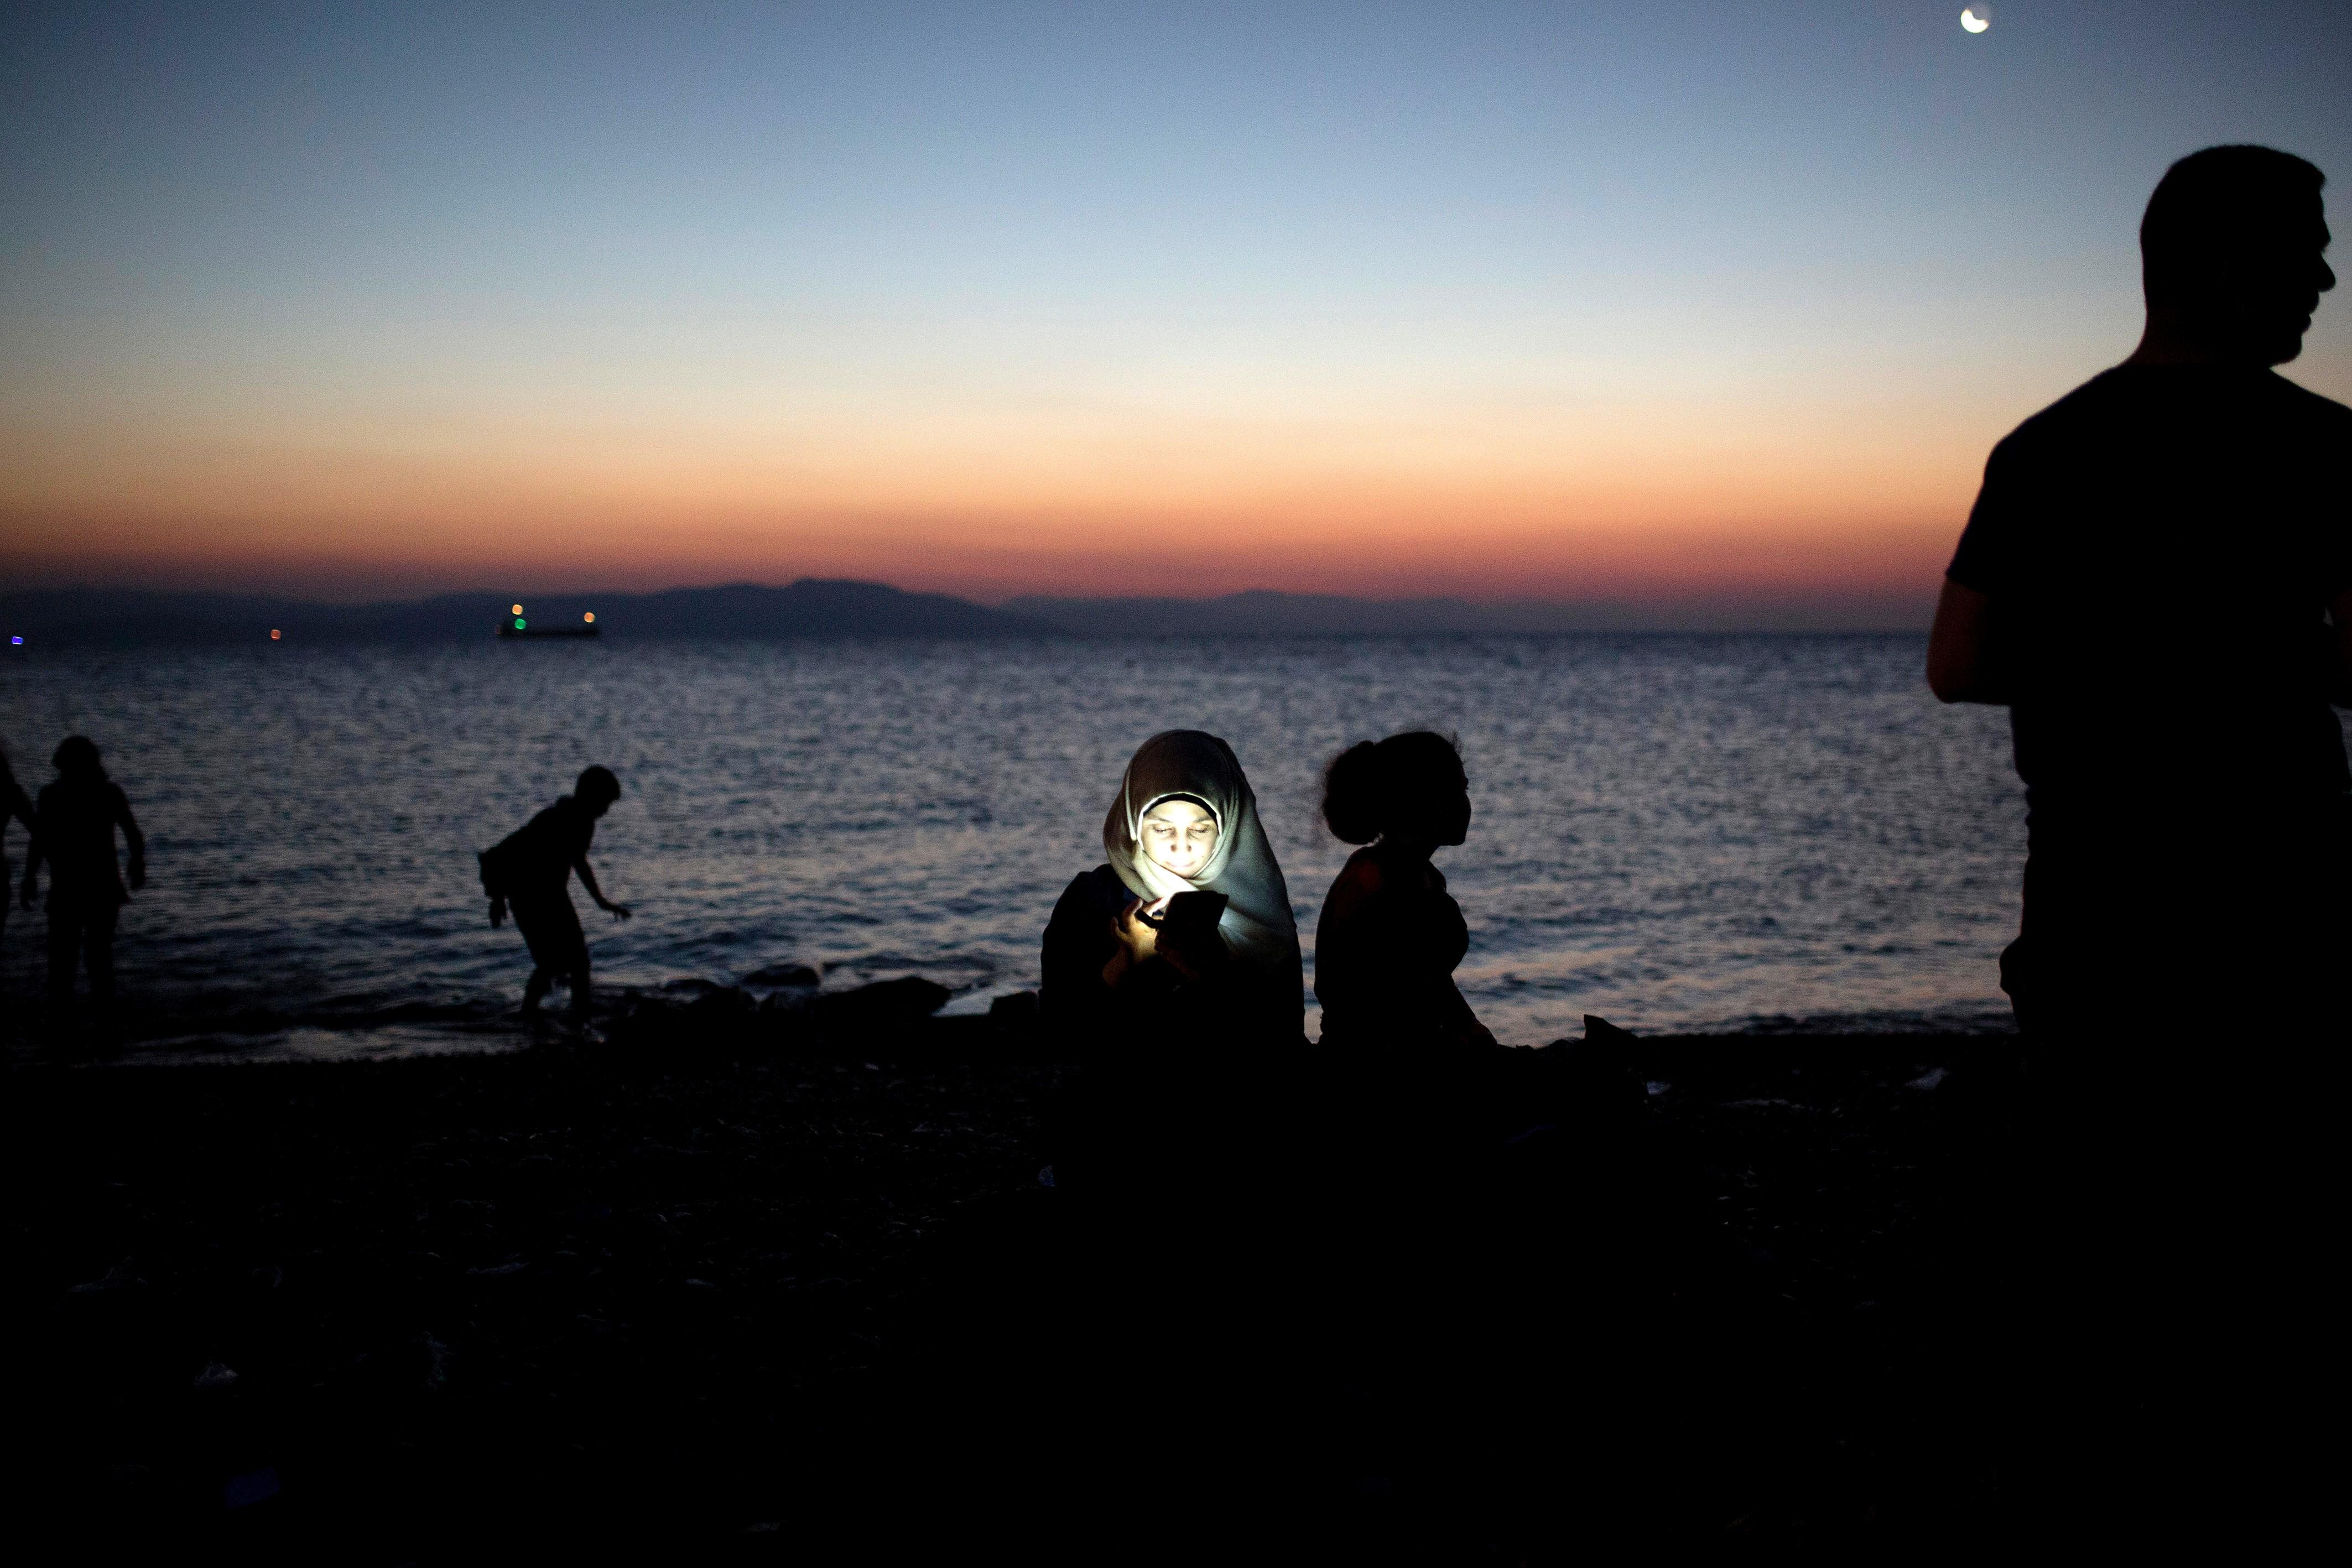 Greece: Refugee women speak out against violence, dangerous